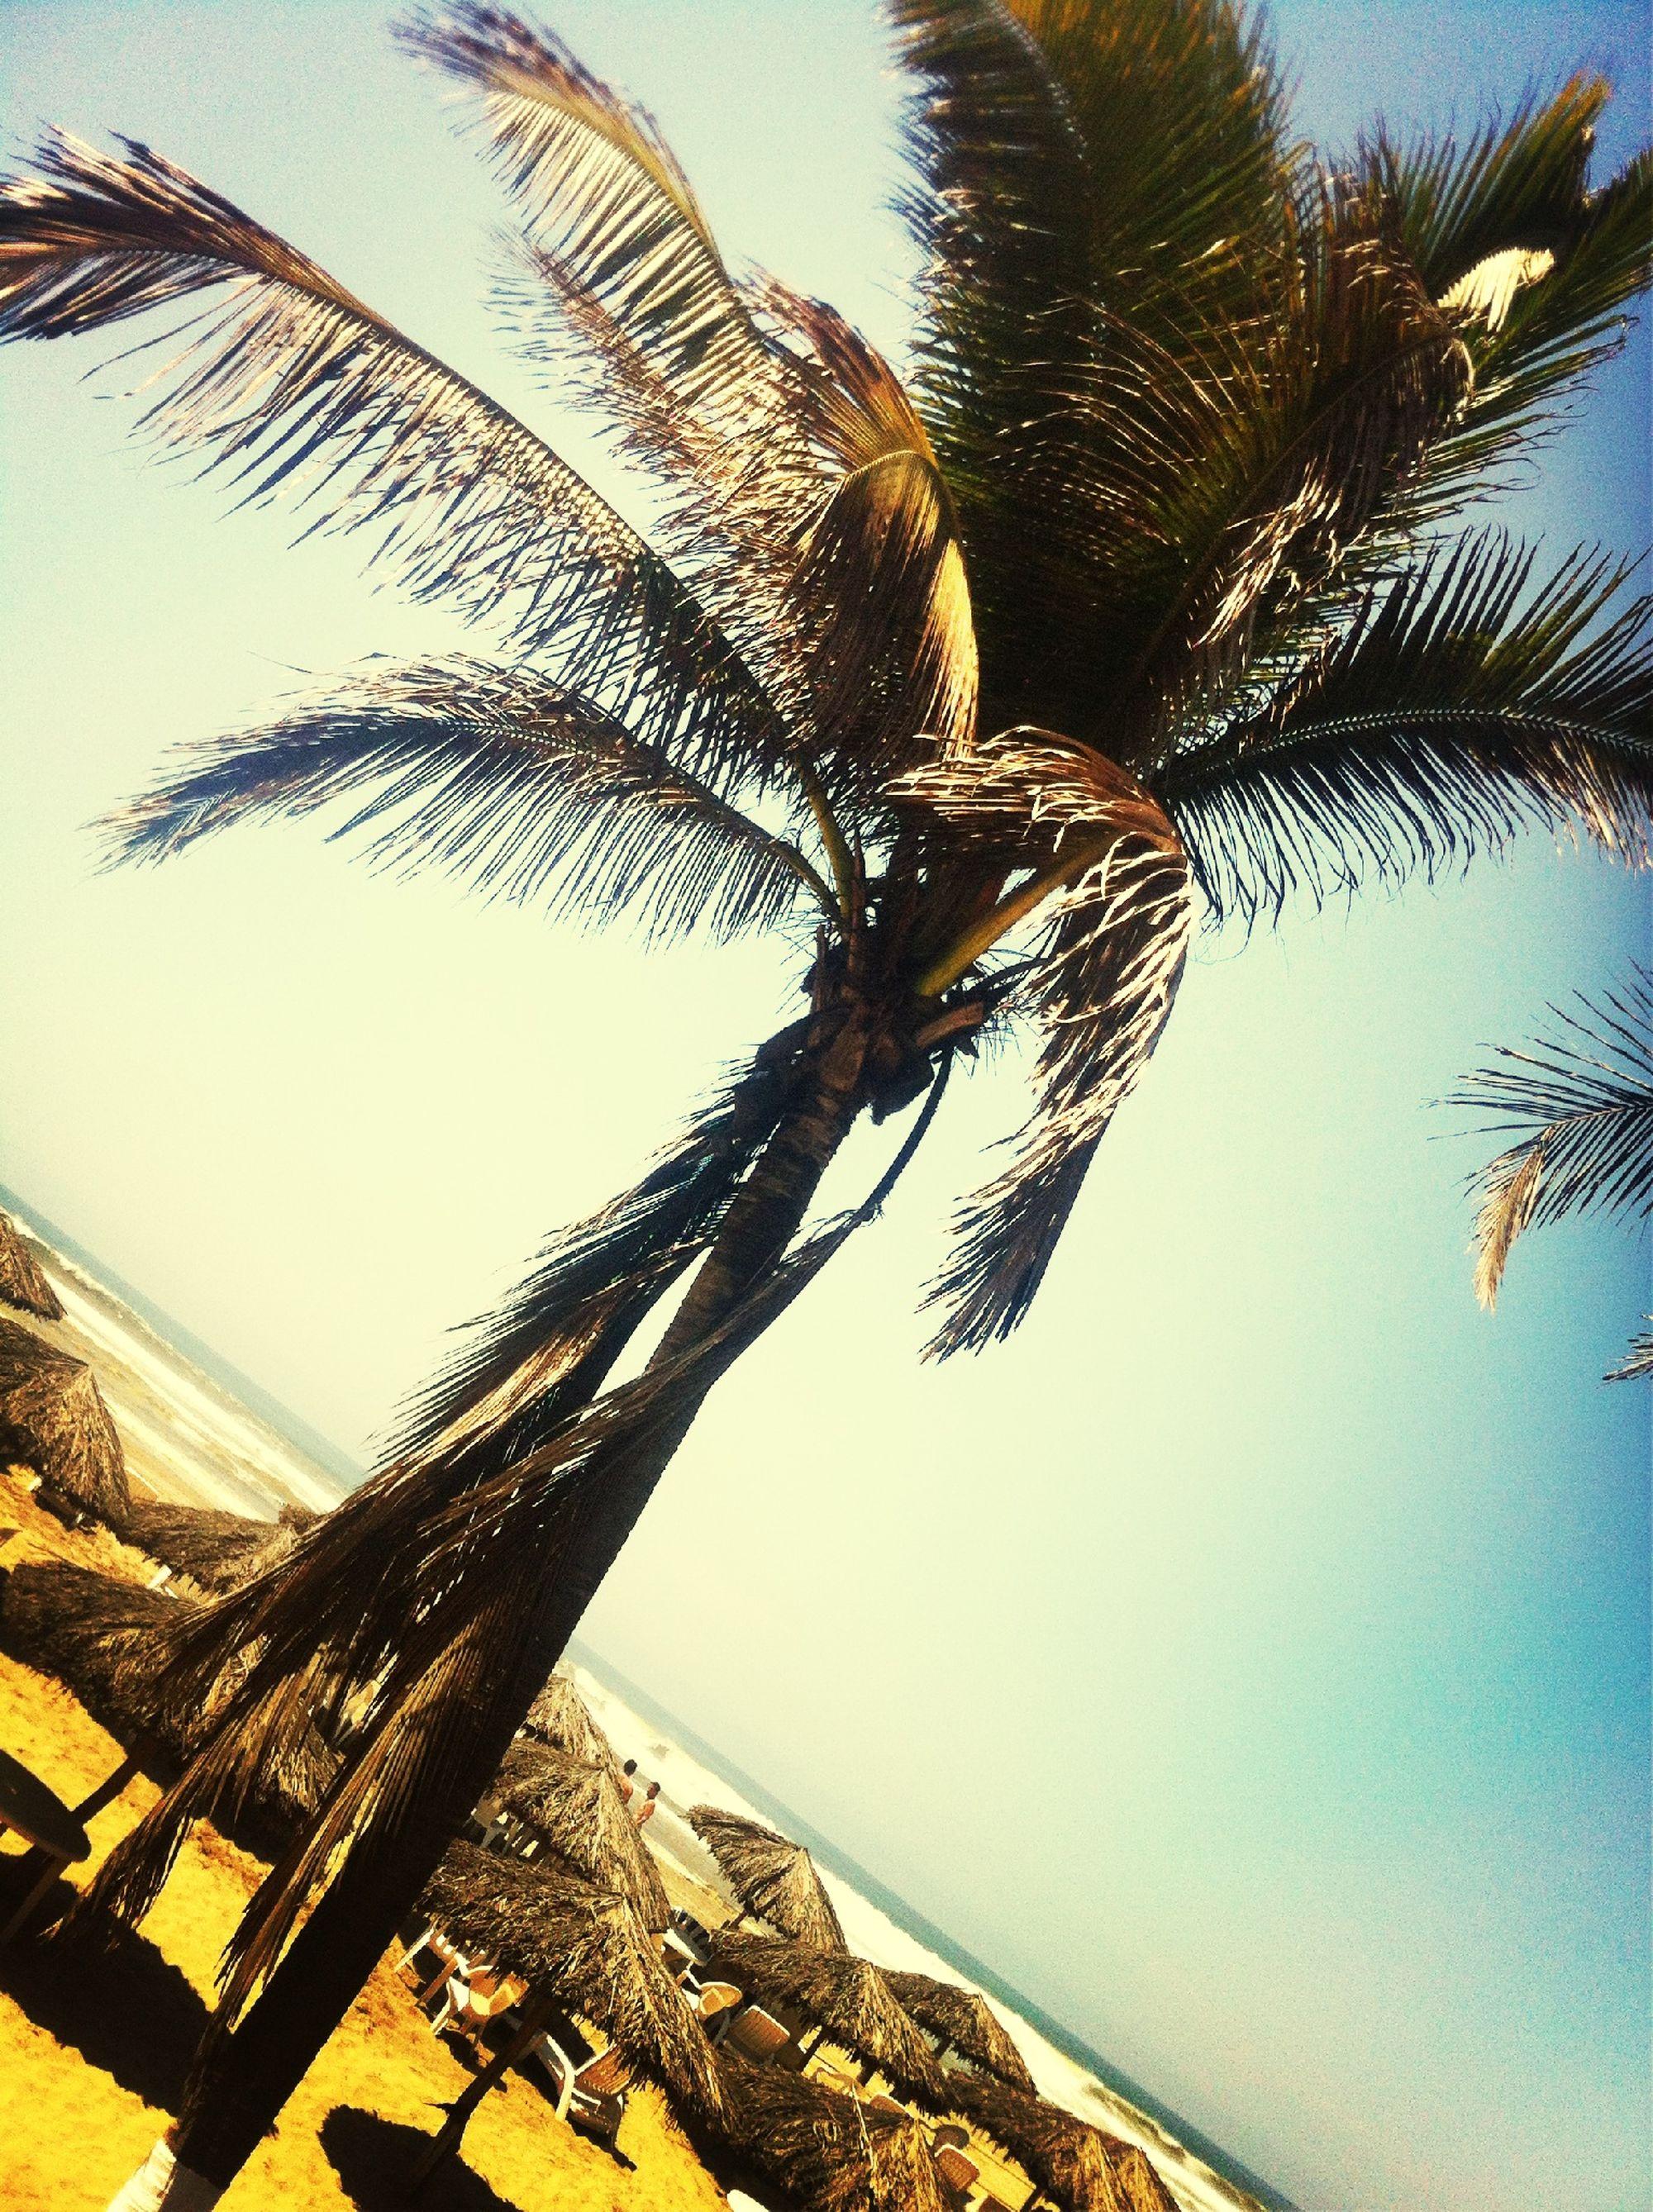 palm trees at paseo de la reforma Palm Trees